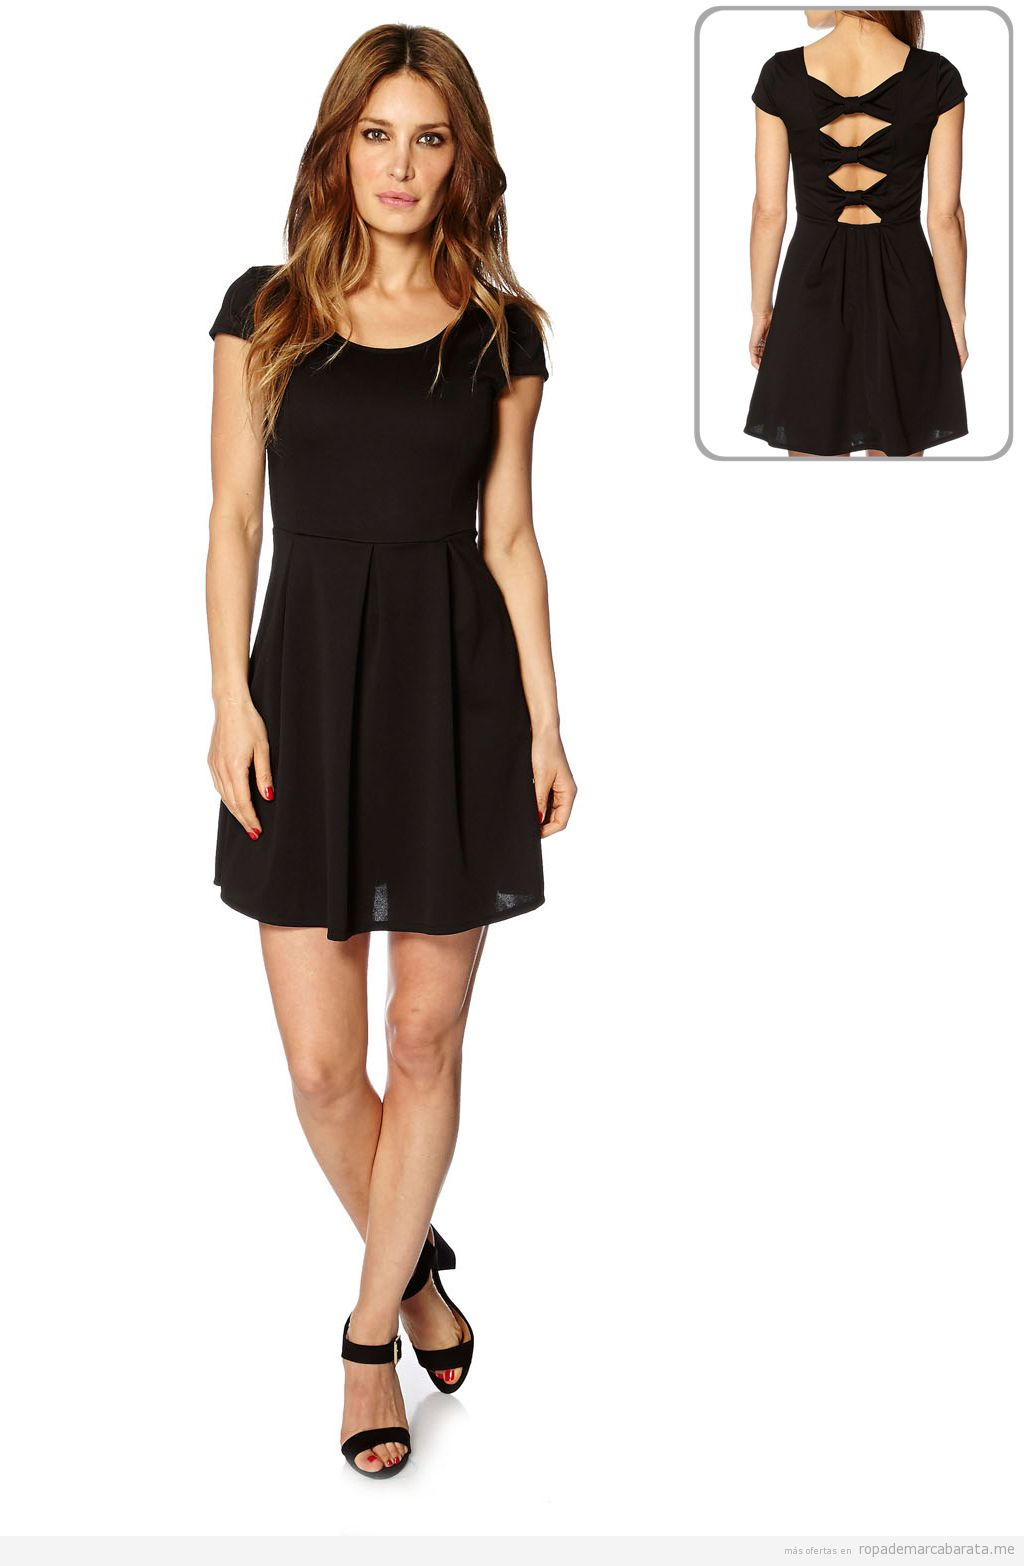 Vestidos verano marca French Connection baratos, outlet online 2